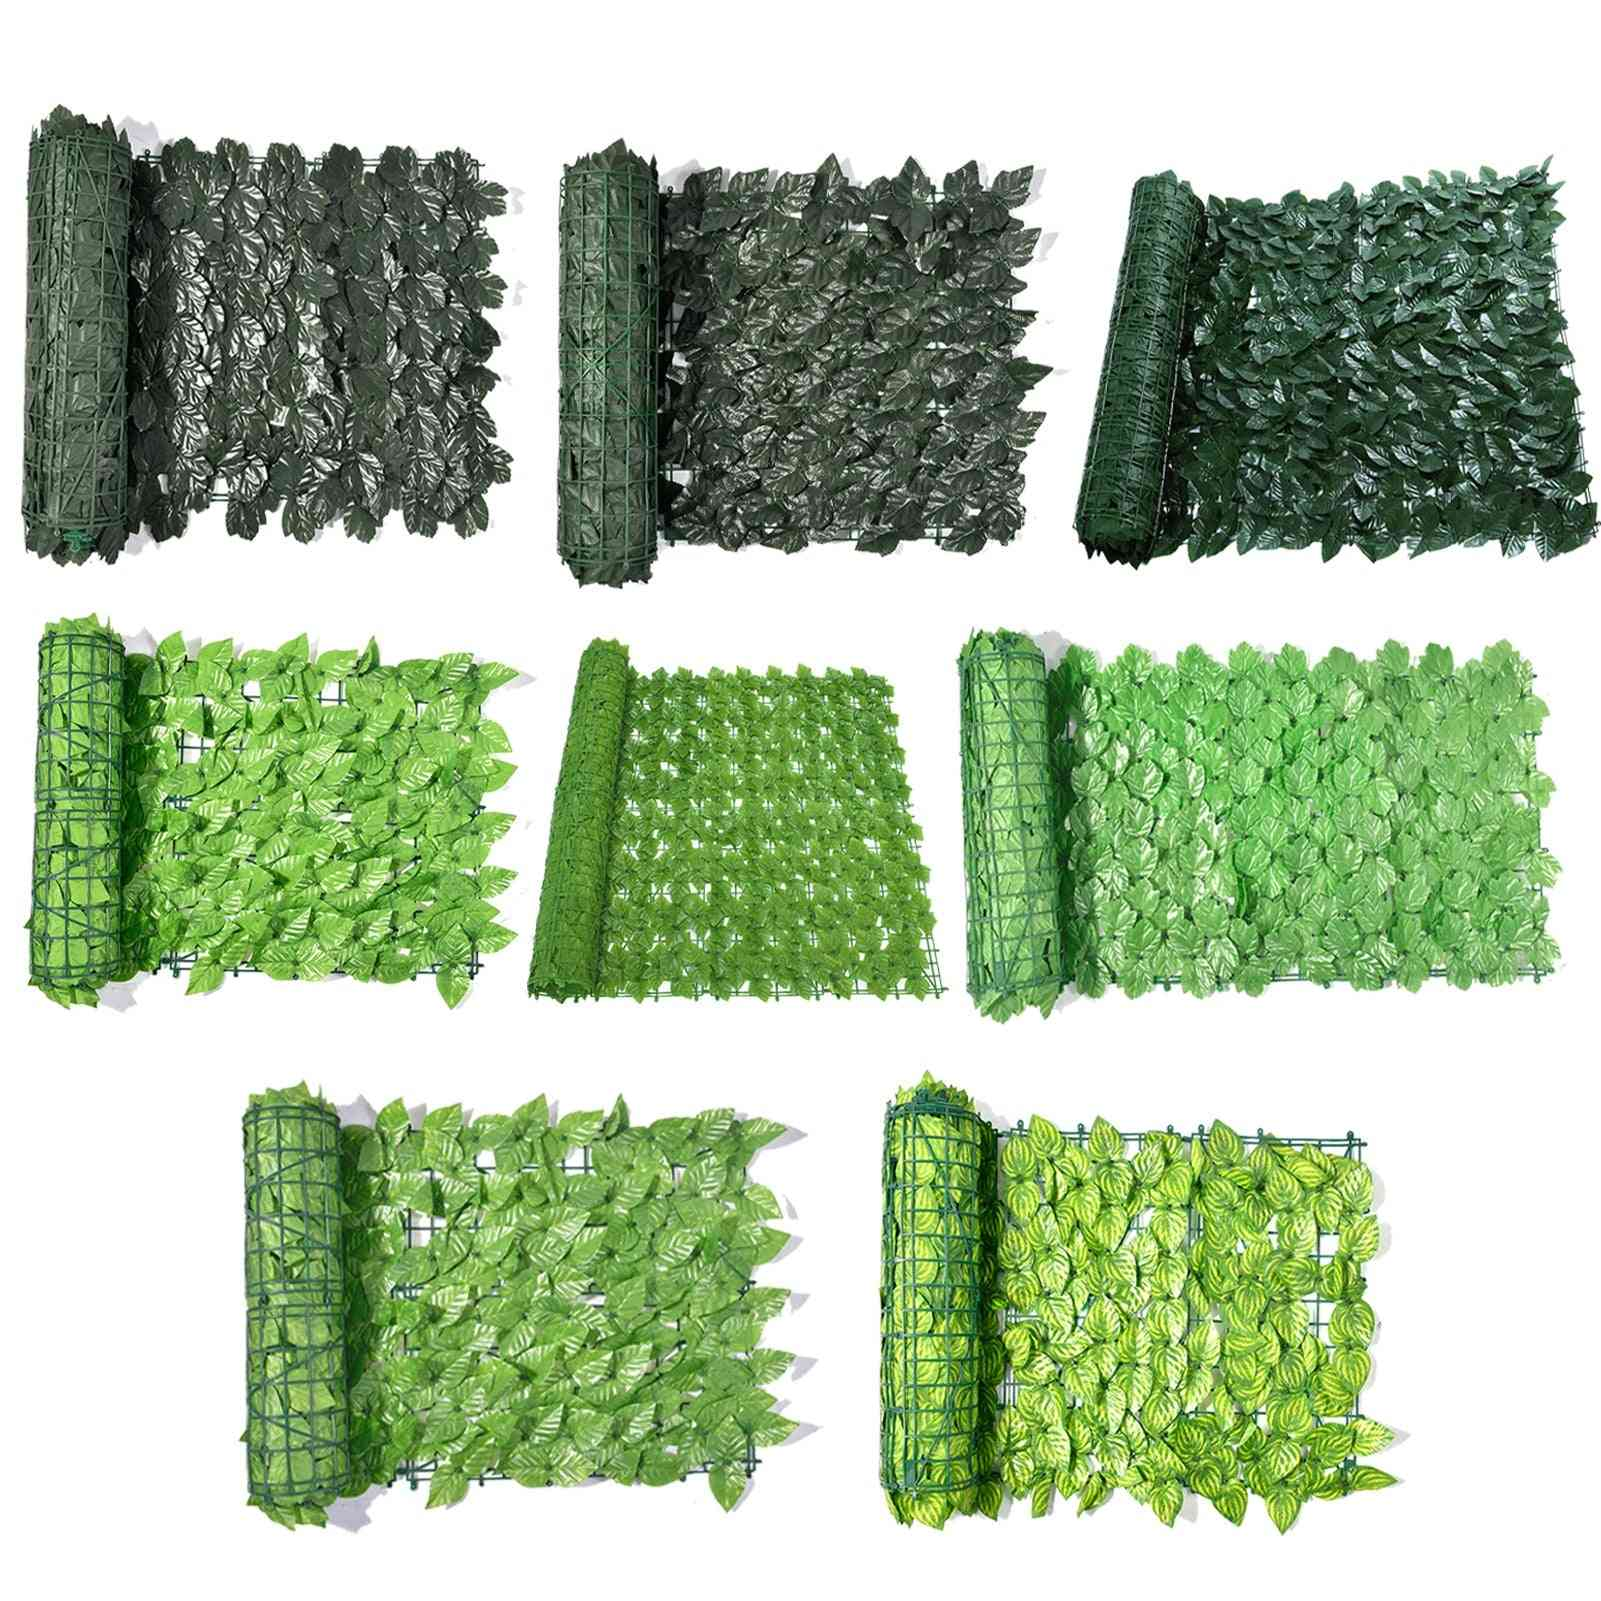 Artificial Ivy Hedge Screening Roll Green Leaf